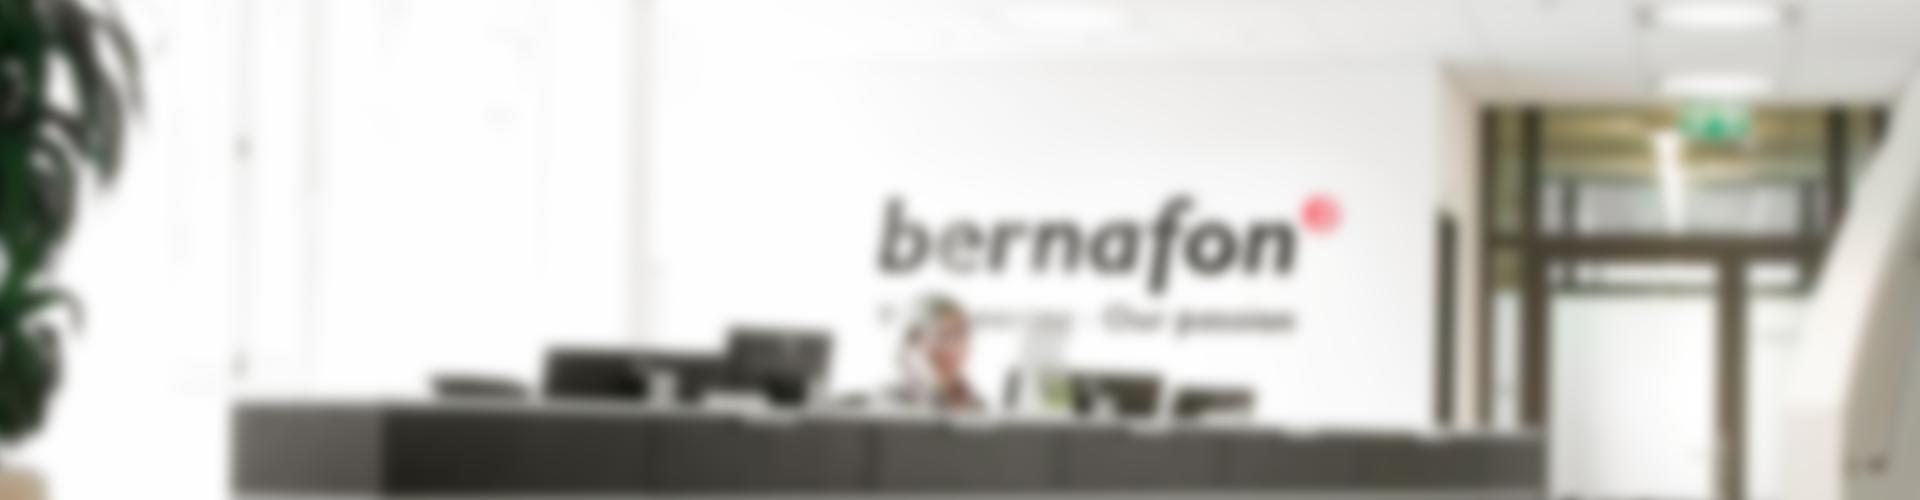 BF_Header_contact_1920_500